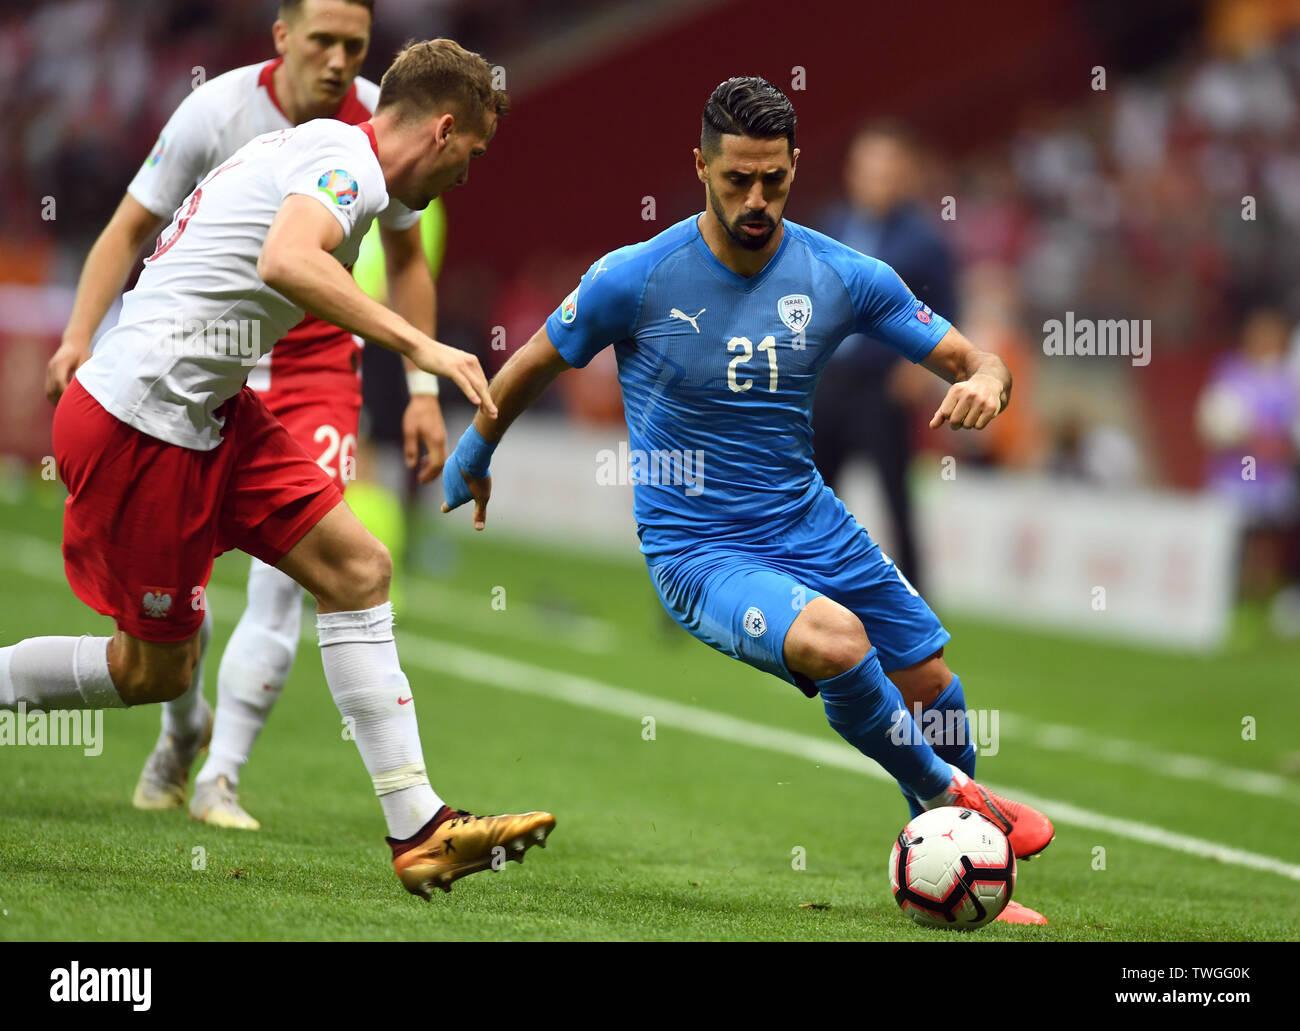 Warsaw, Poland, June 10, 2019: EURO 2020 qualifing round, group stage, Poland wins 4:0 with Izarel on PGE Narodowy. Beram Kayal (Izrael) - Stock Image